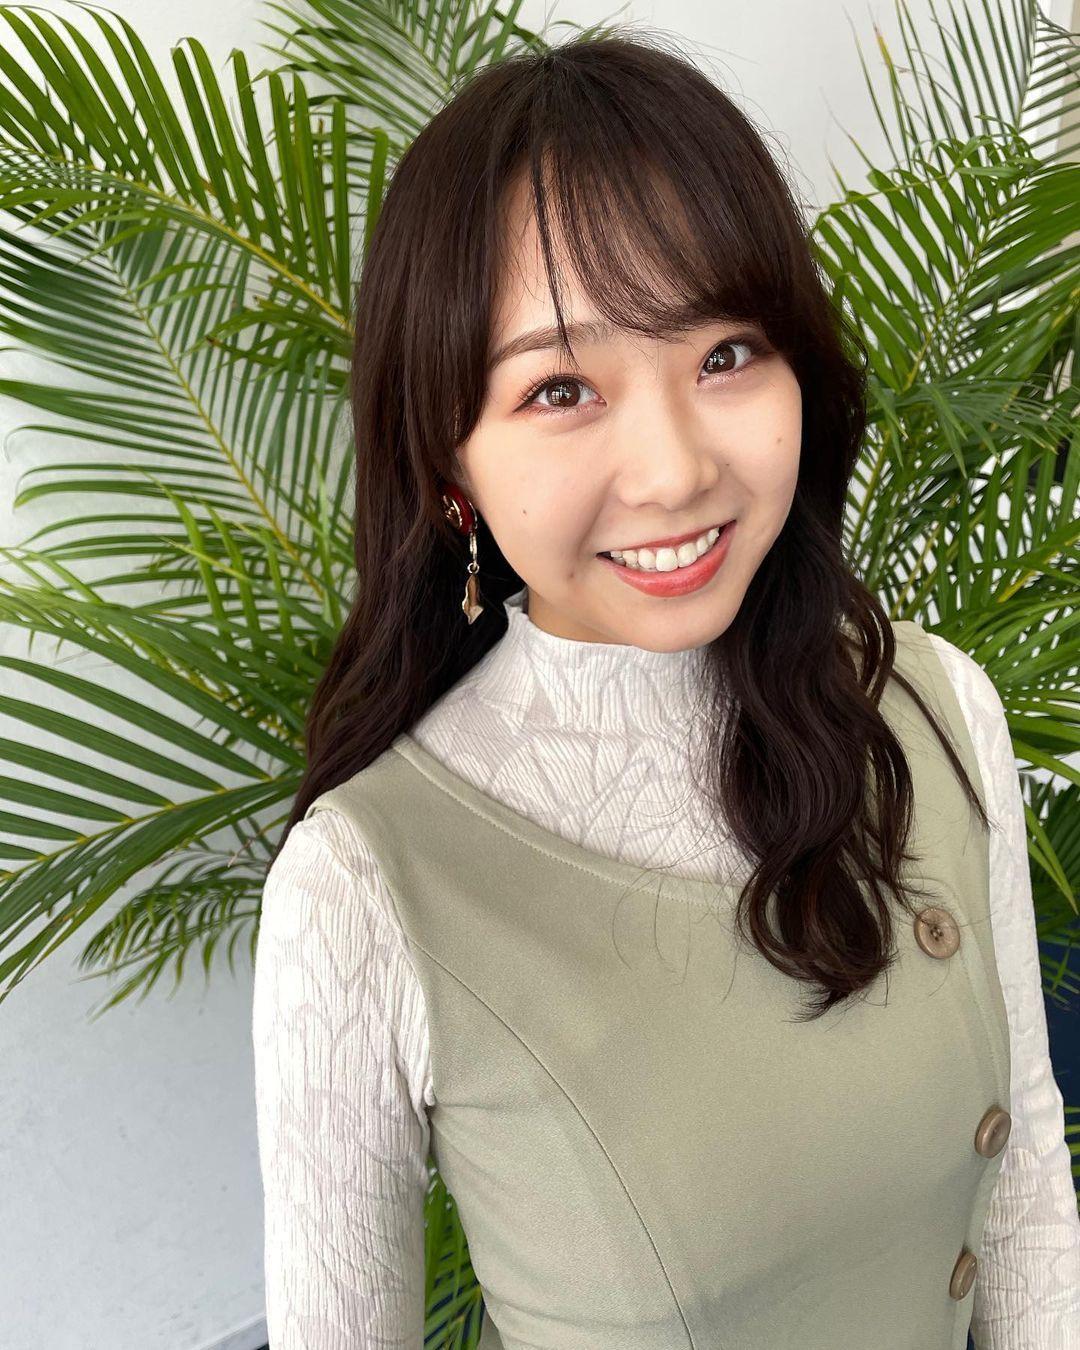 NMB48肉系偶像「加藤夕夏」肉感十足插图(4)